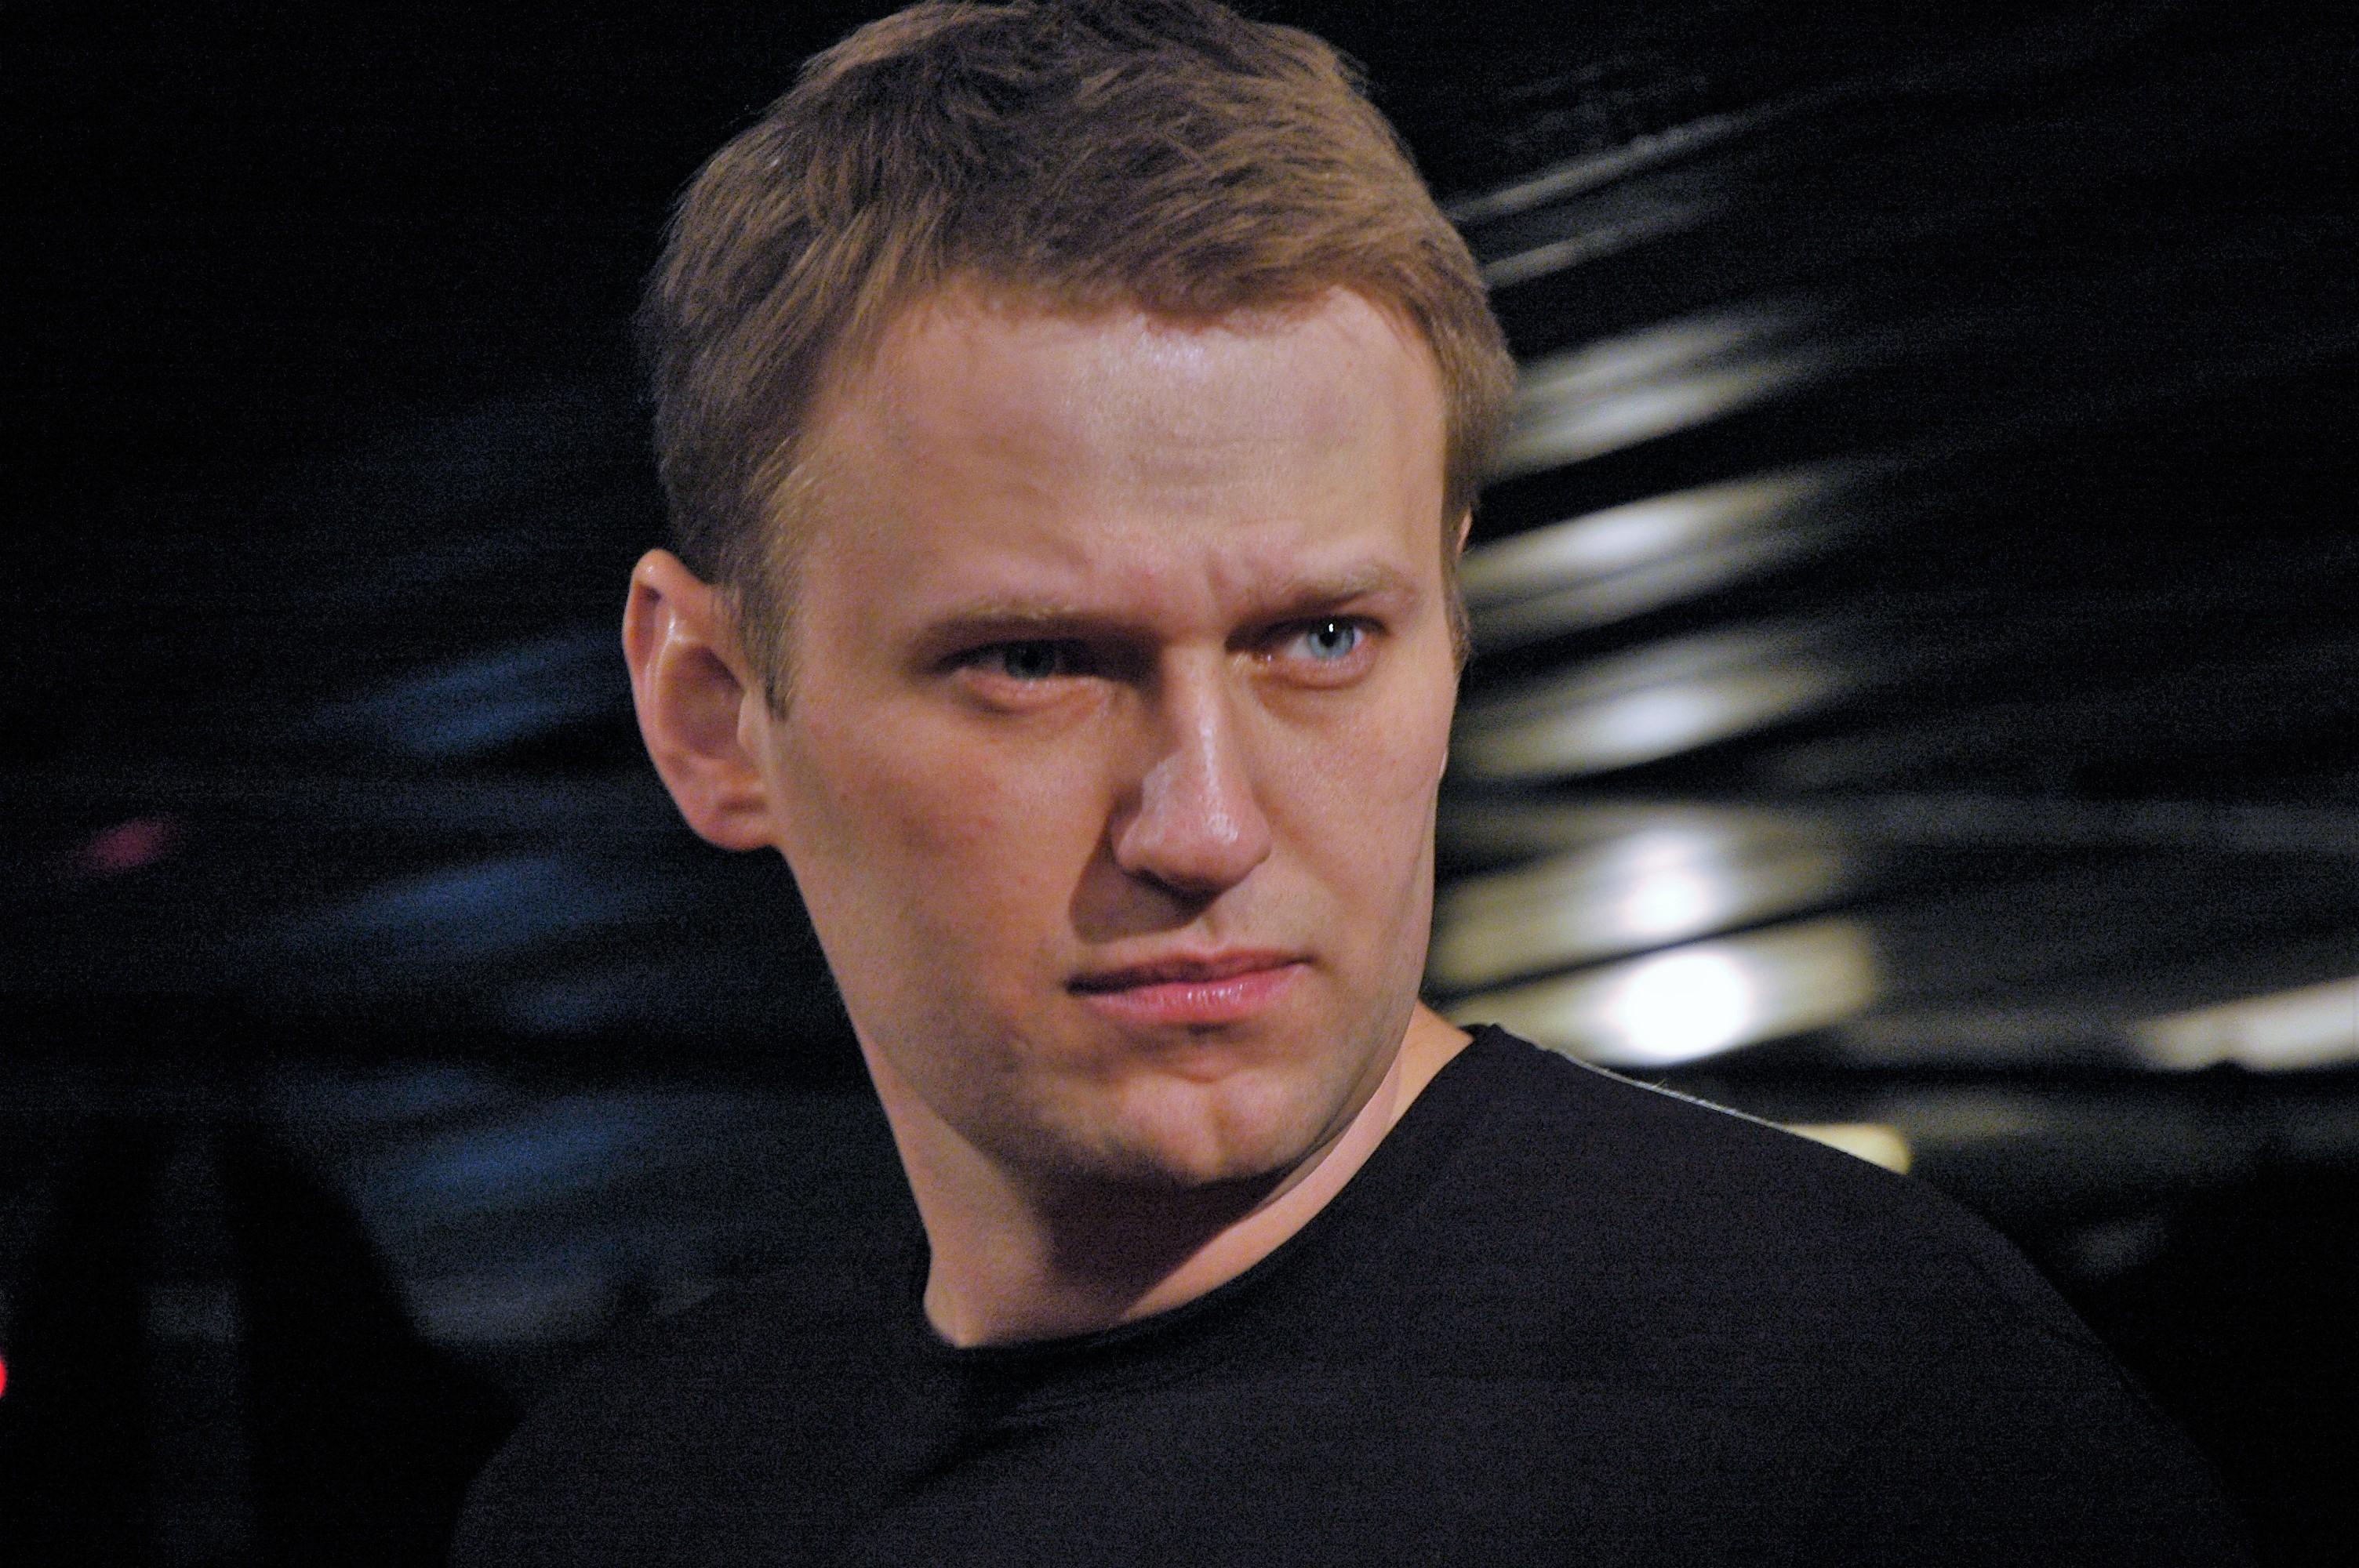 File:Navalny.JPG - Wikimedia Commons